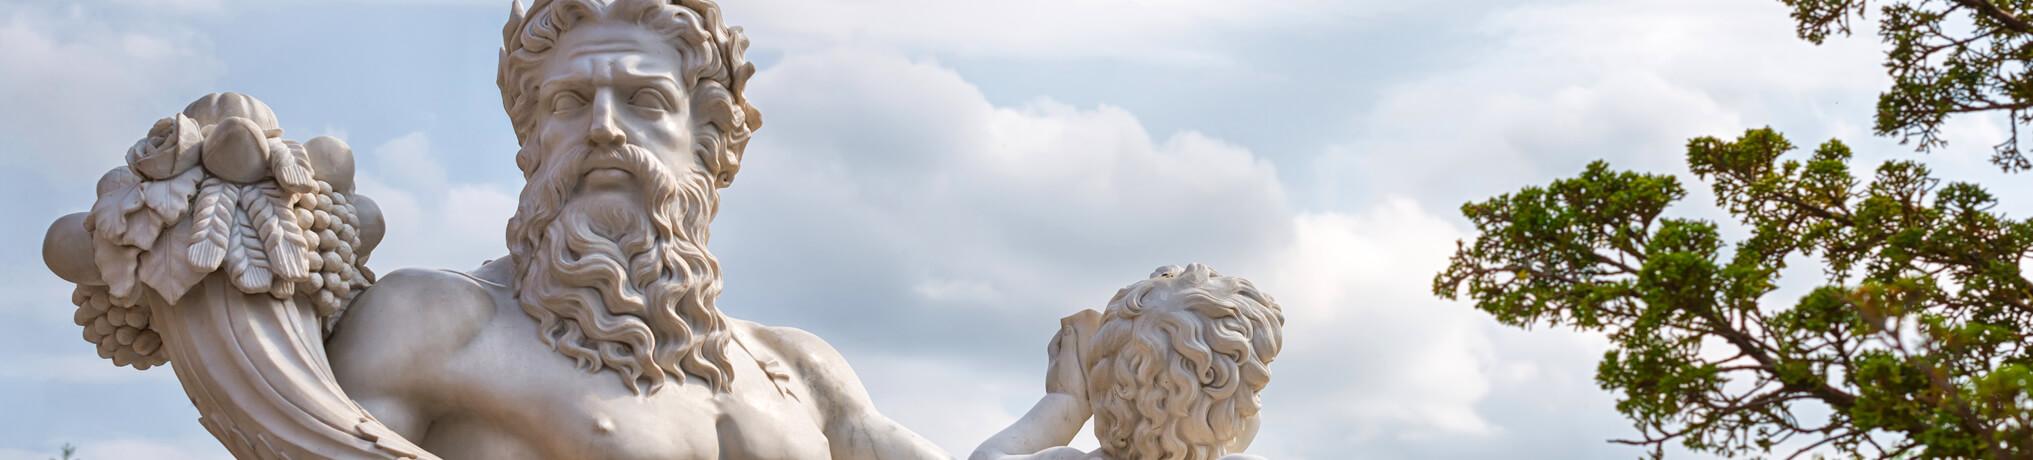 Skulpturen Stein Figuren online kaufen